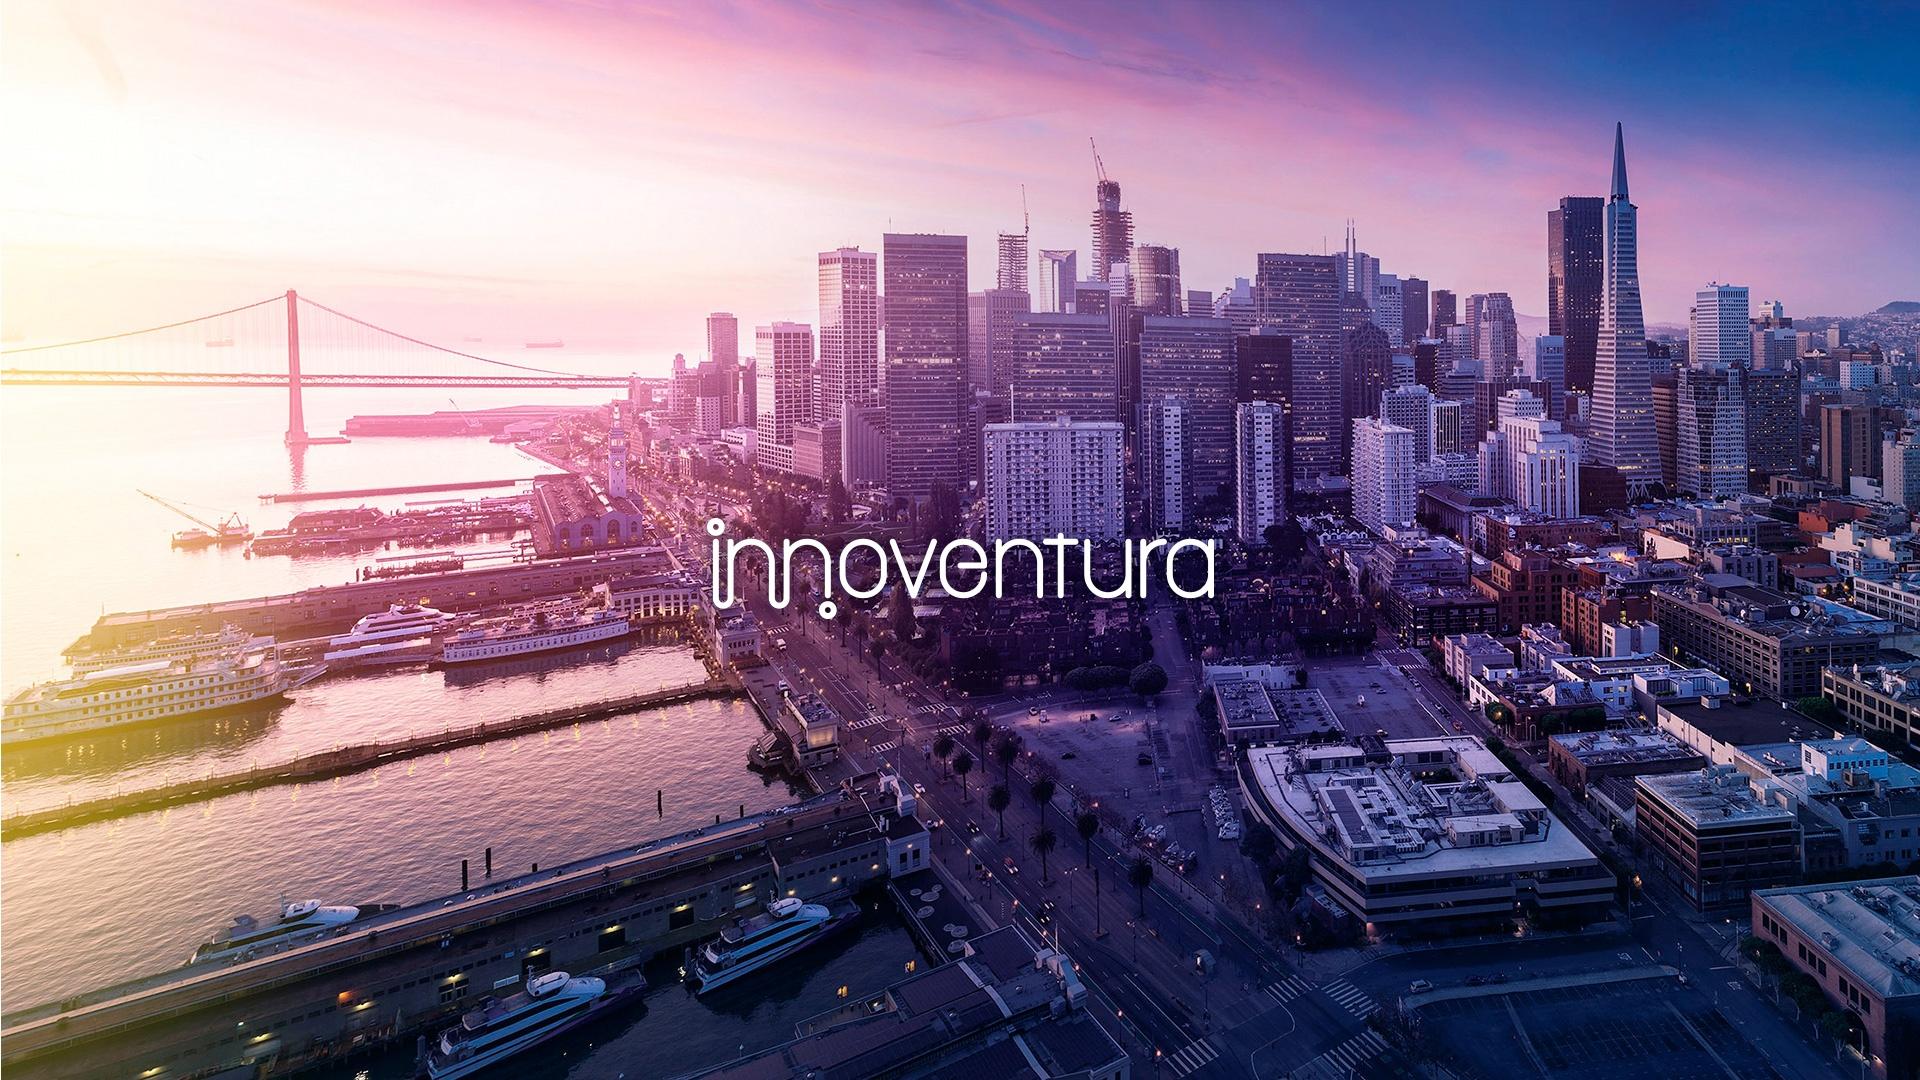 background_innoventura_v4.jpg